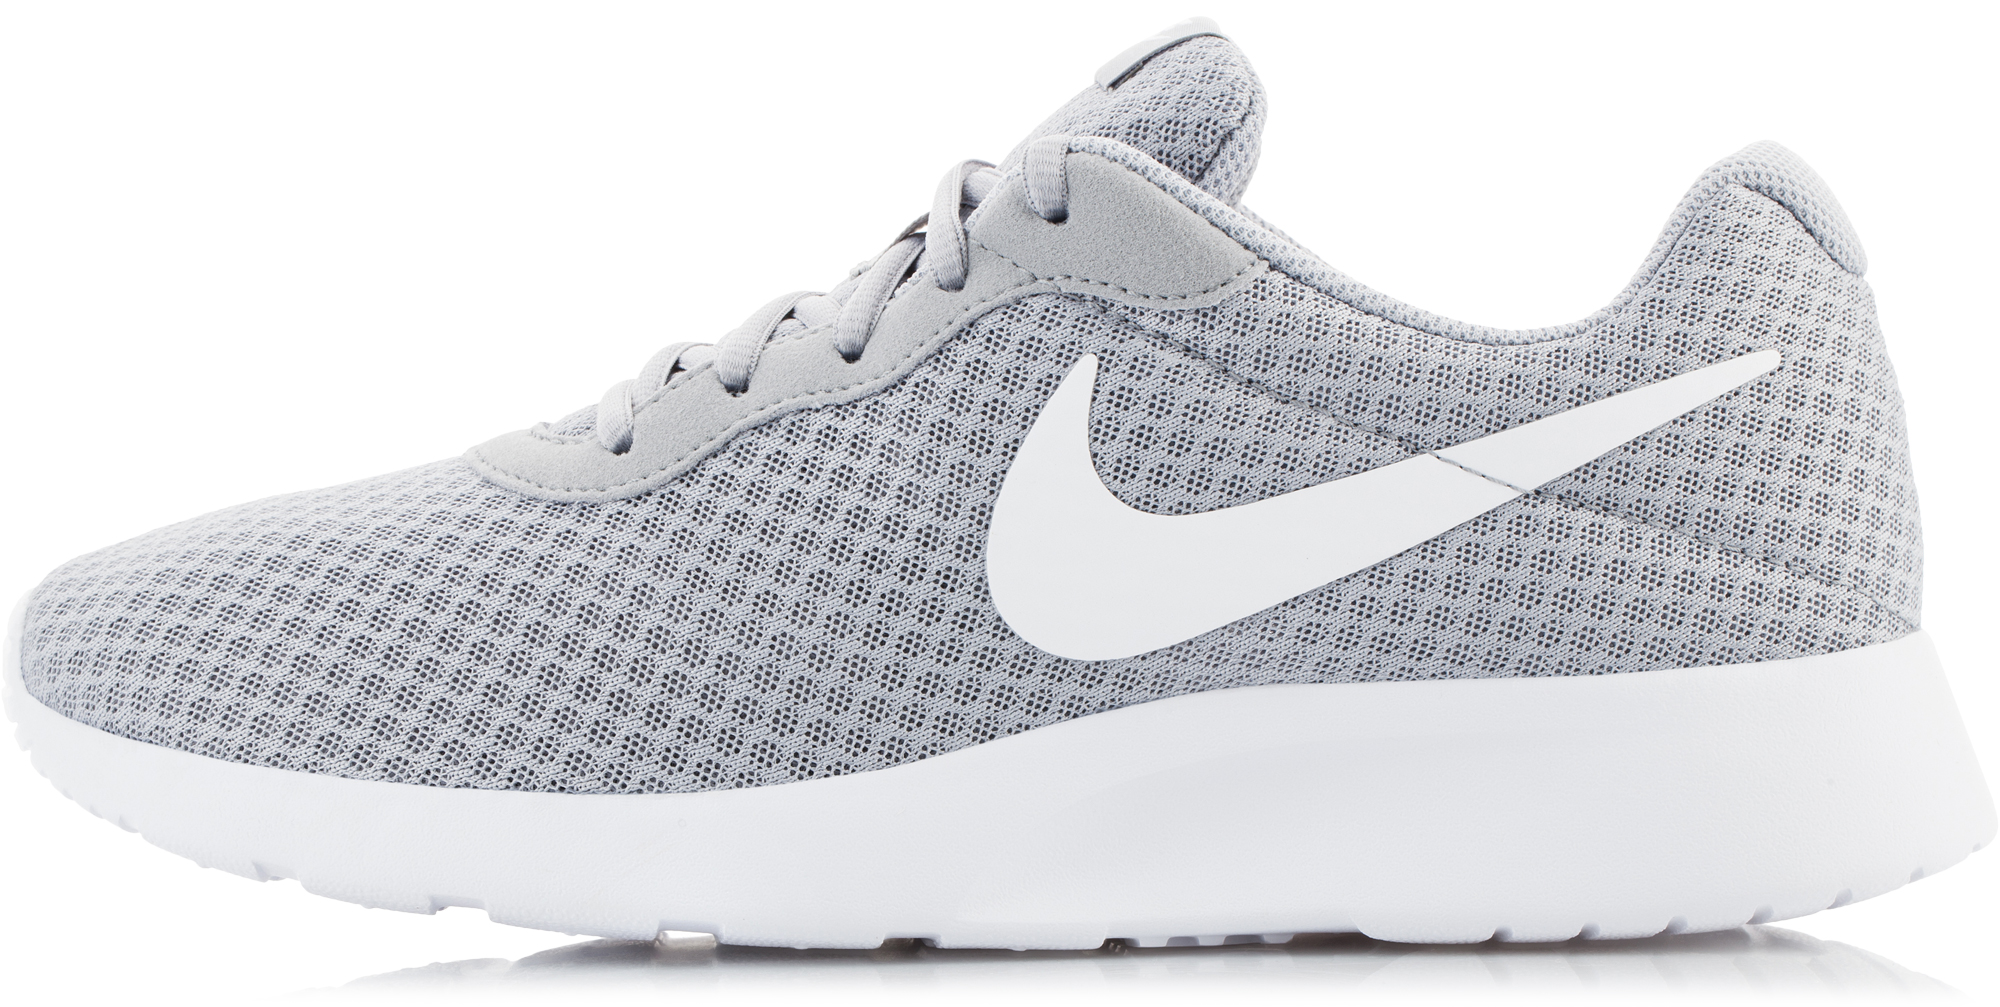 Nike Кроссовки мужские Nike Tanjun, размер 44